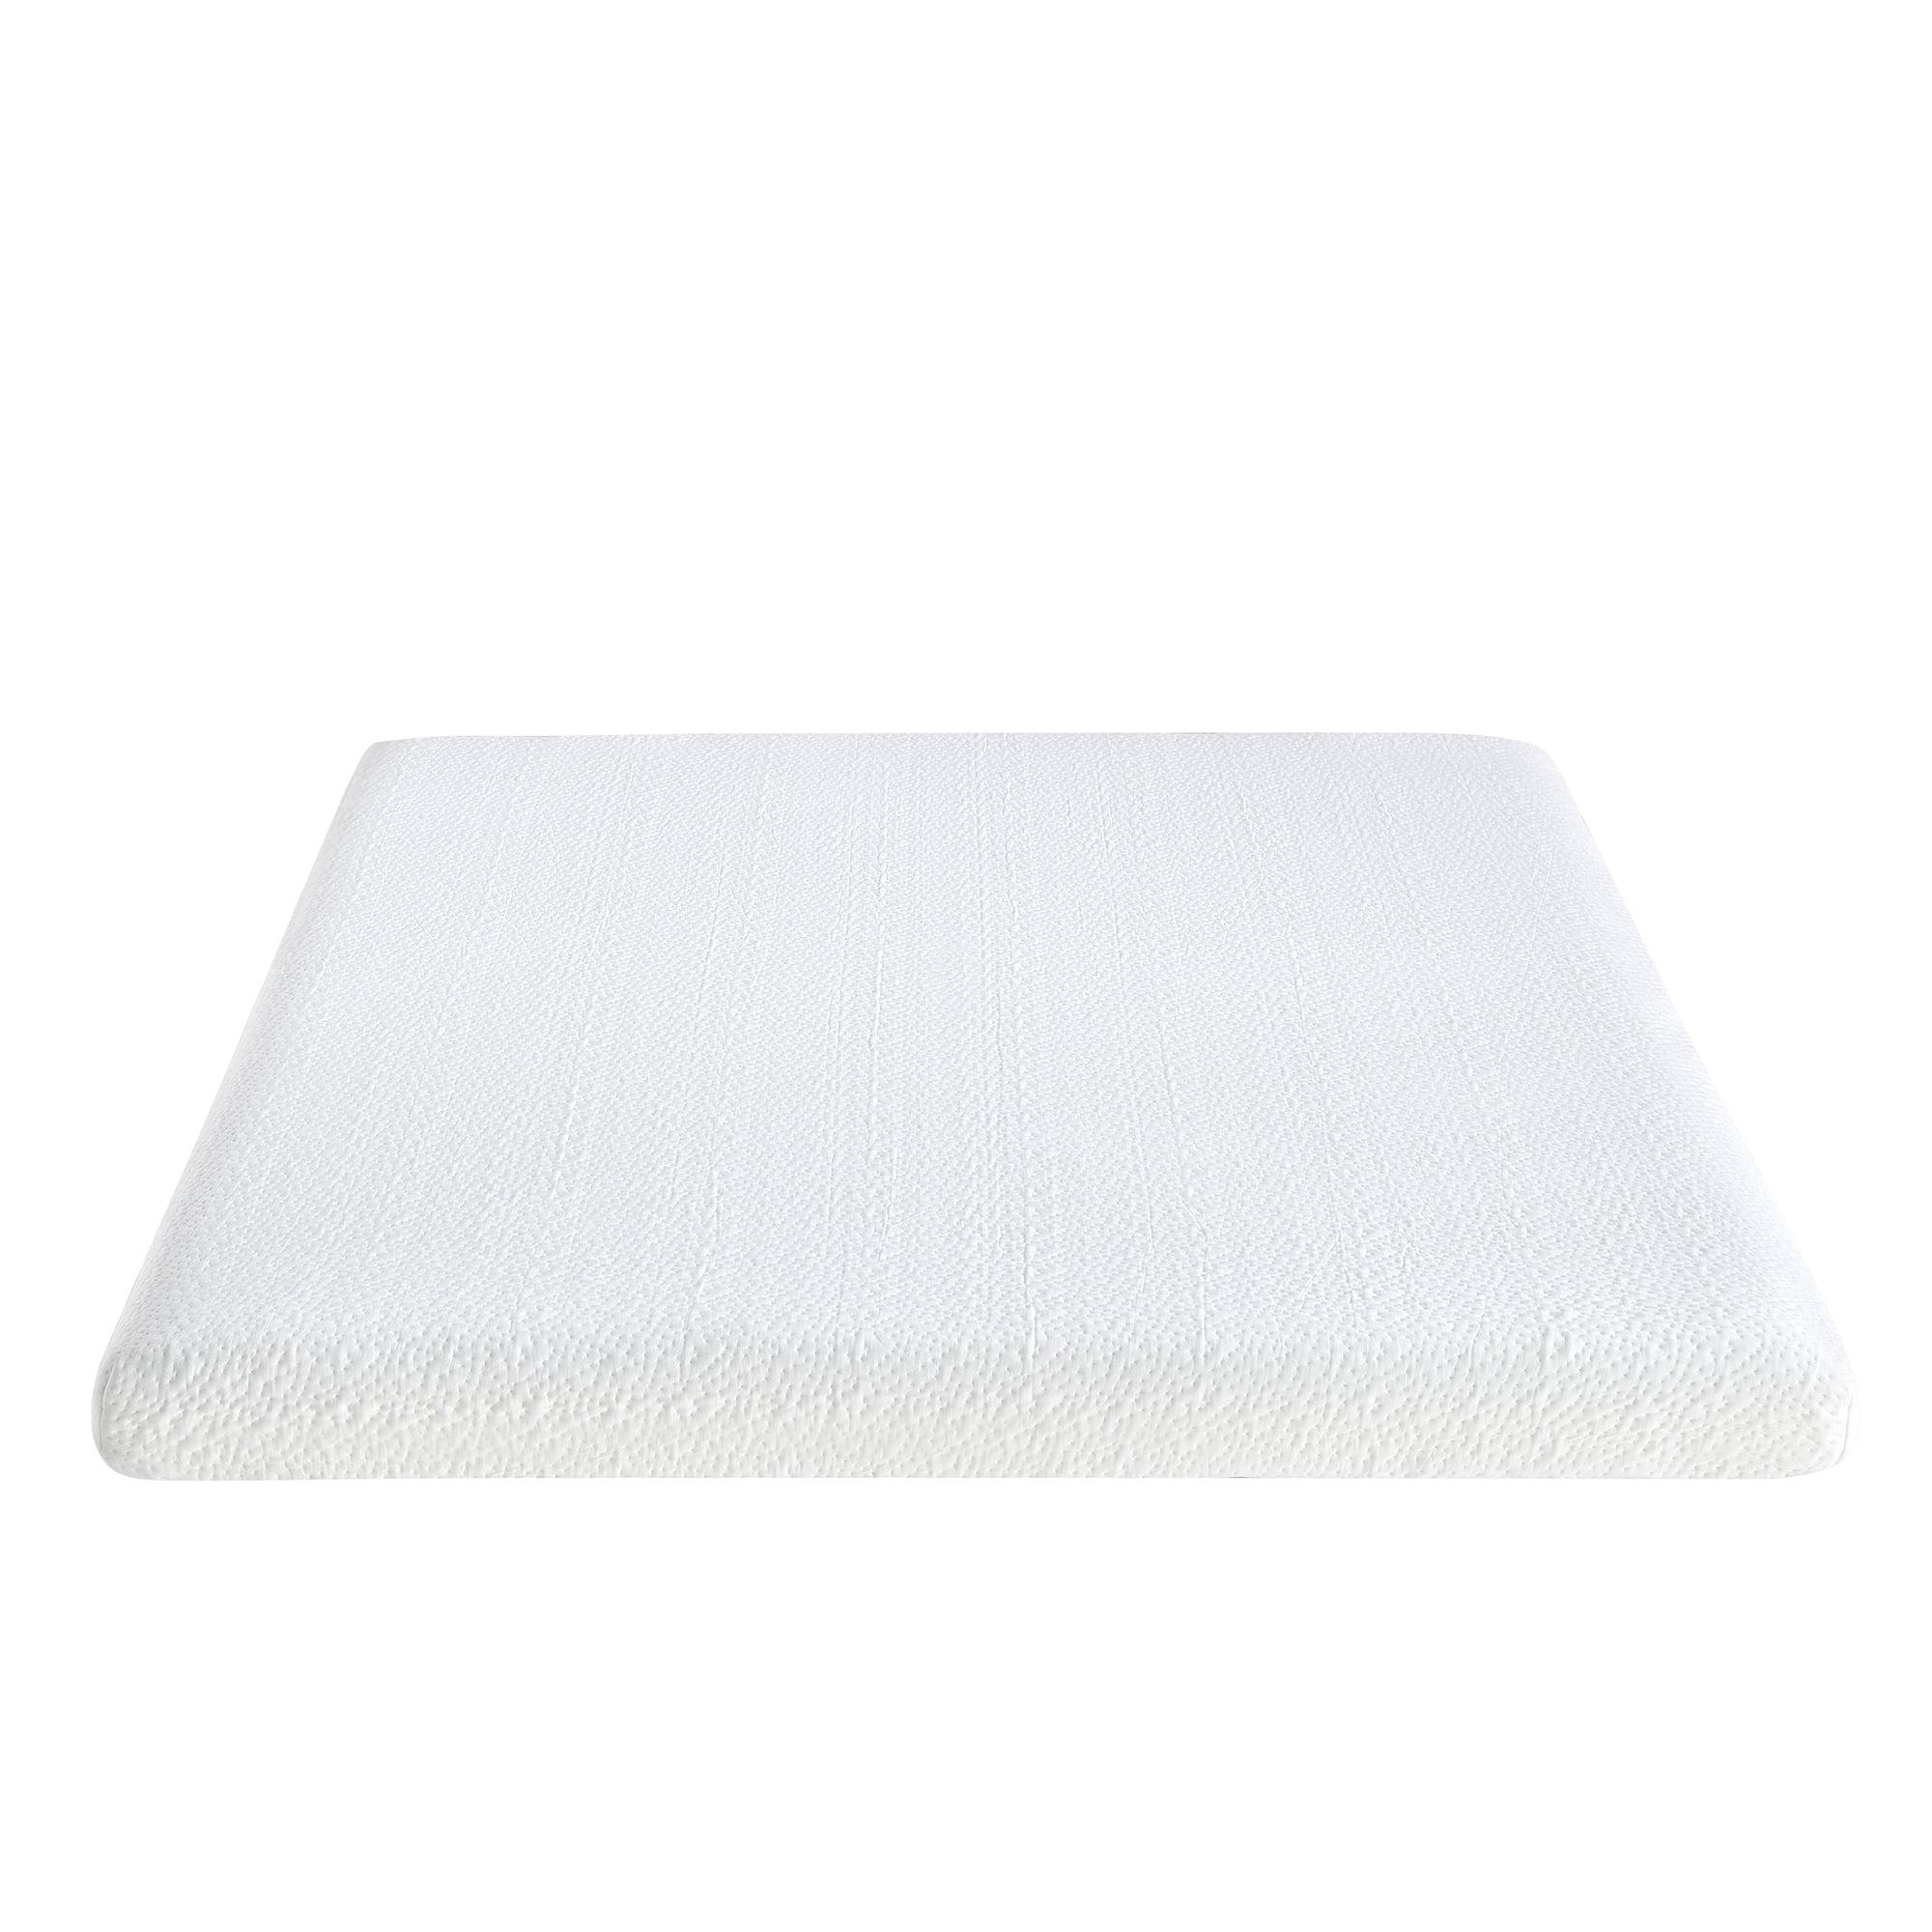 Superb Modern Sleep Memory Foam Replacement Sofa Bed 4 5 Inch Machost Co Dining Chair Design Ideas Machostcouk